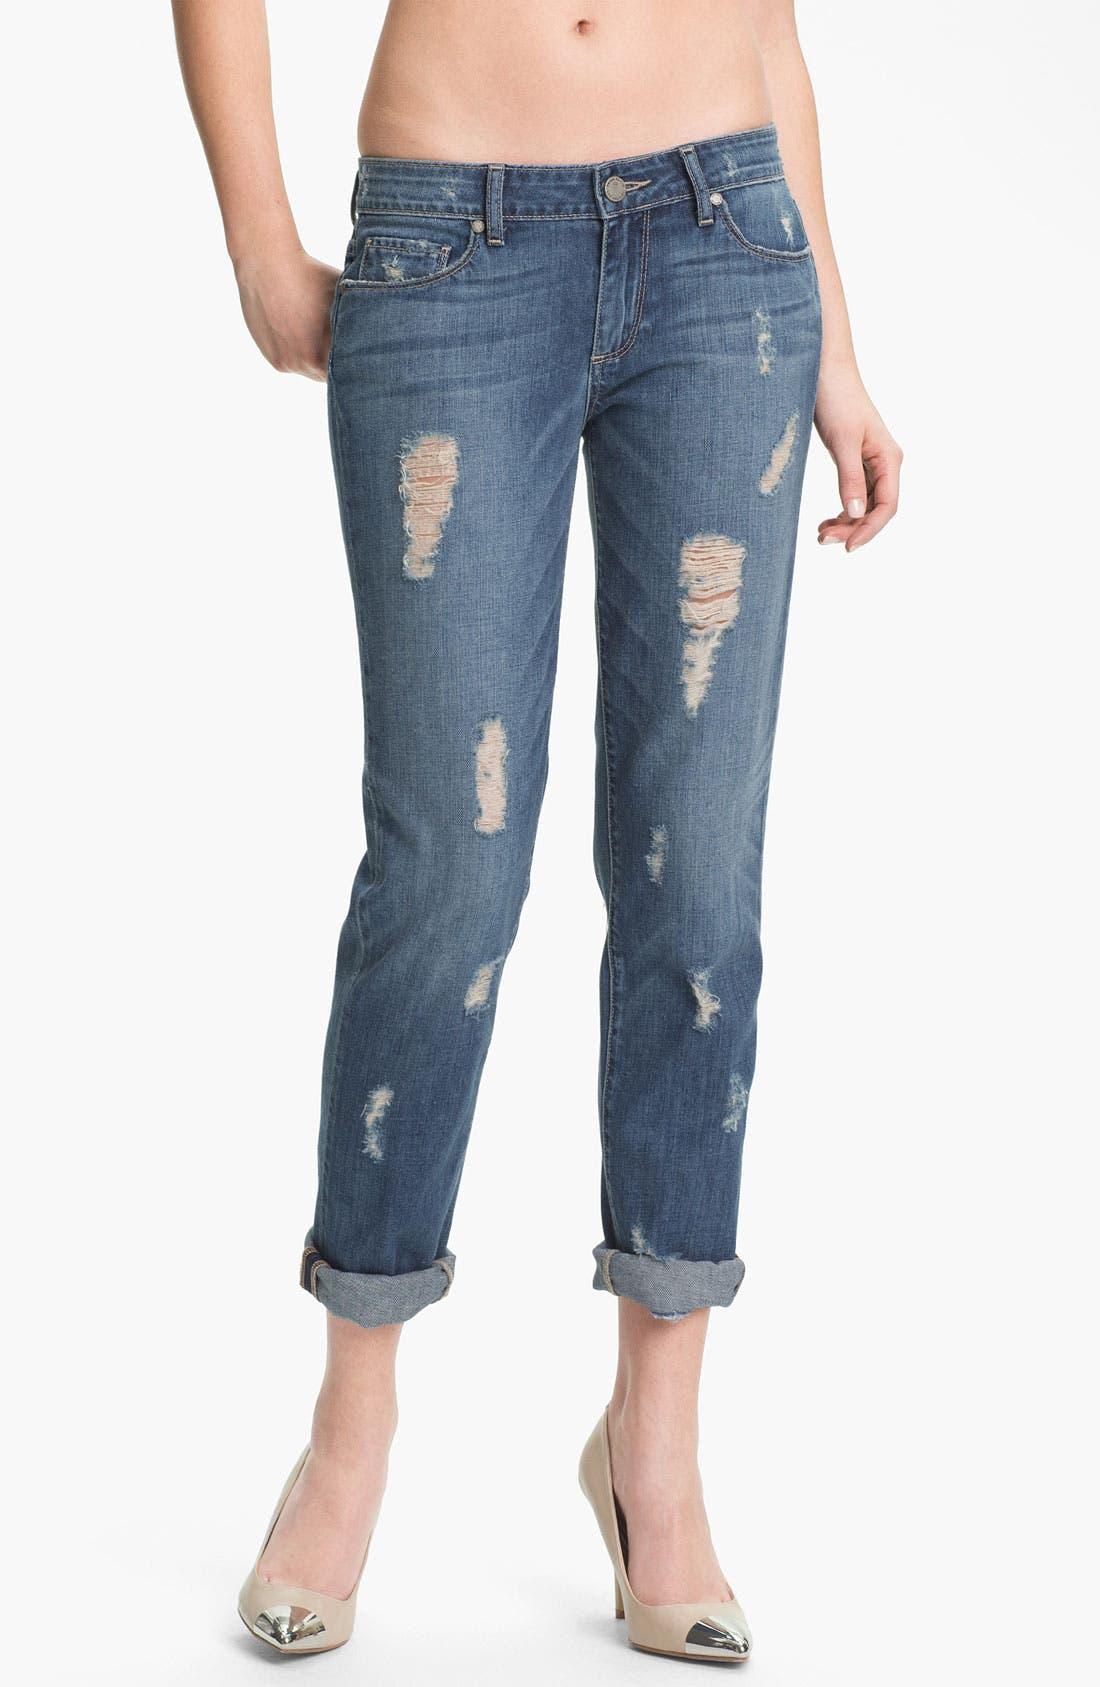 Alternate Image 1 Selected - Paige Denim 'Jimmy Jimmy' Distressed Skinny Jeans (Riley Destruction)